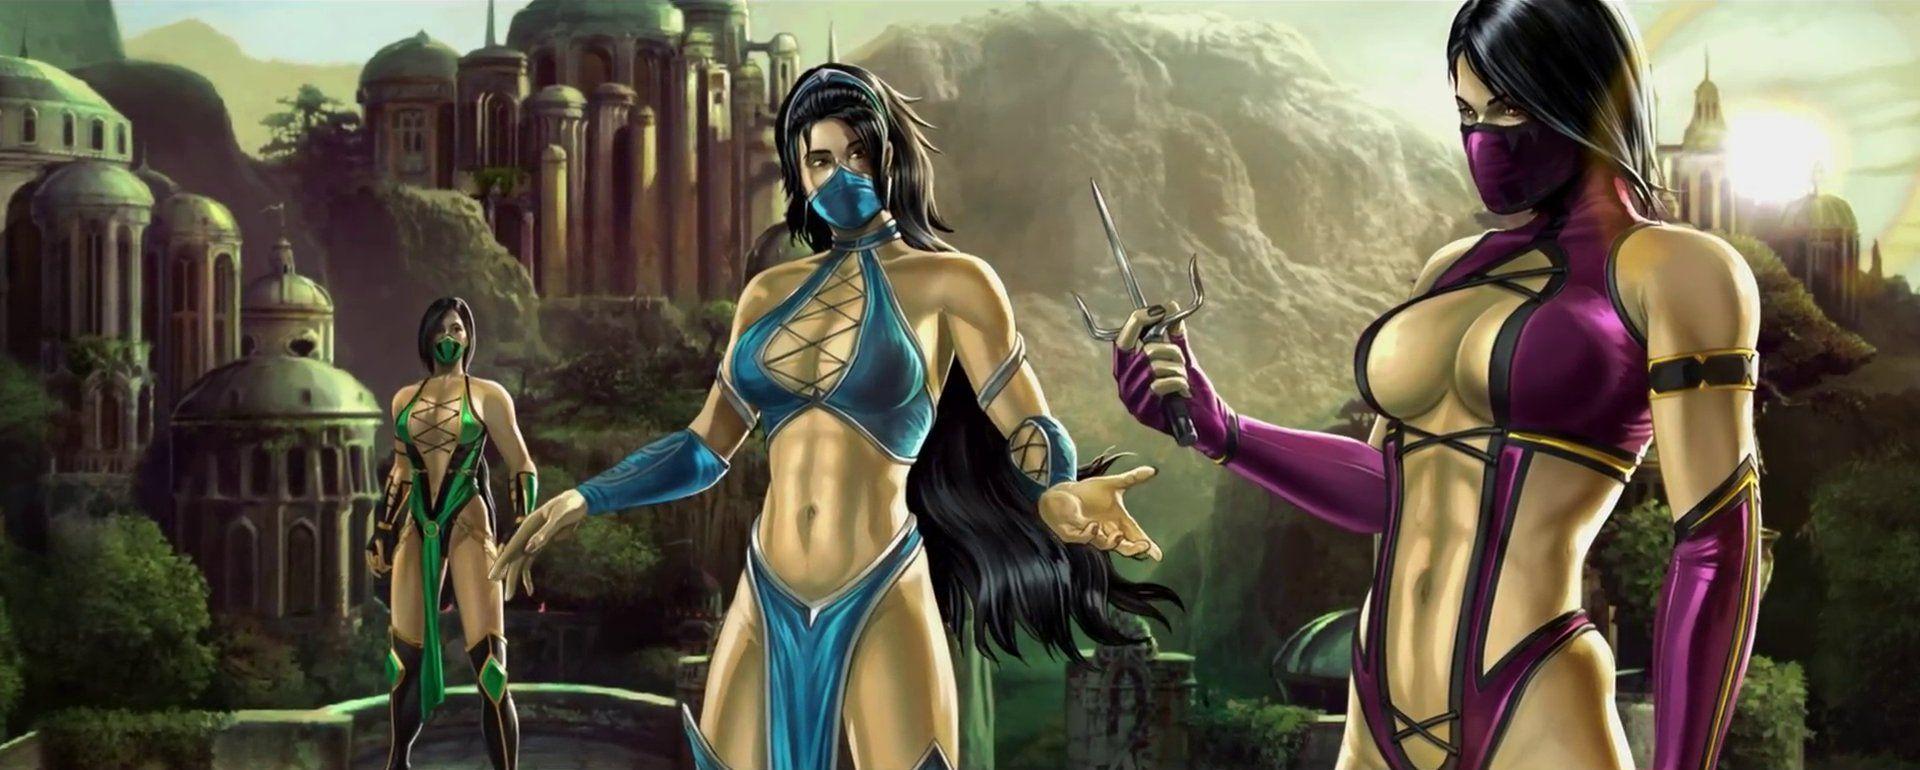 Nicole Scherzinger as Jade (Mortal Kombat) by jcvf138527